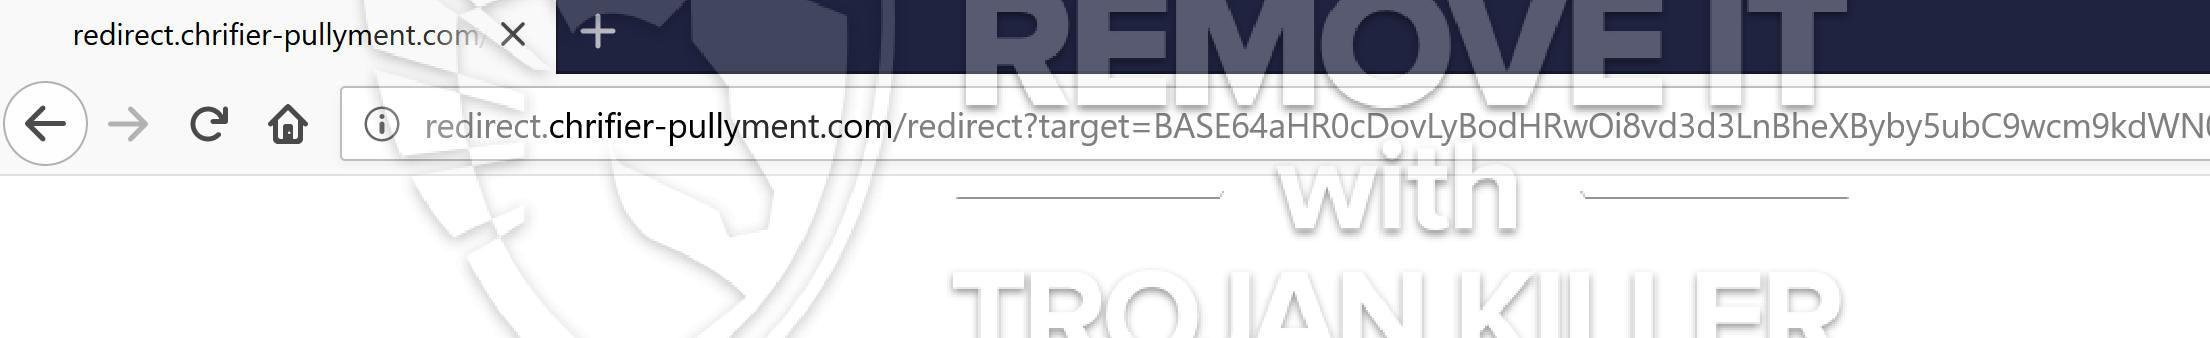 remove Redirect.chrifier-pullyment.com virus